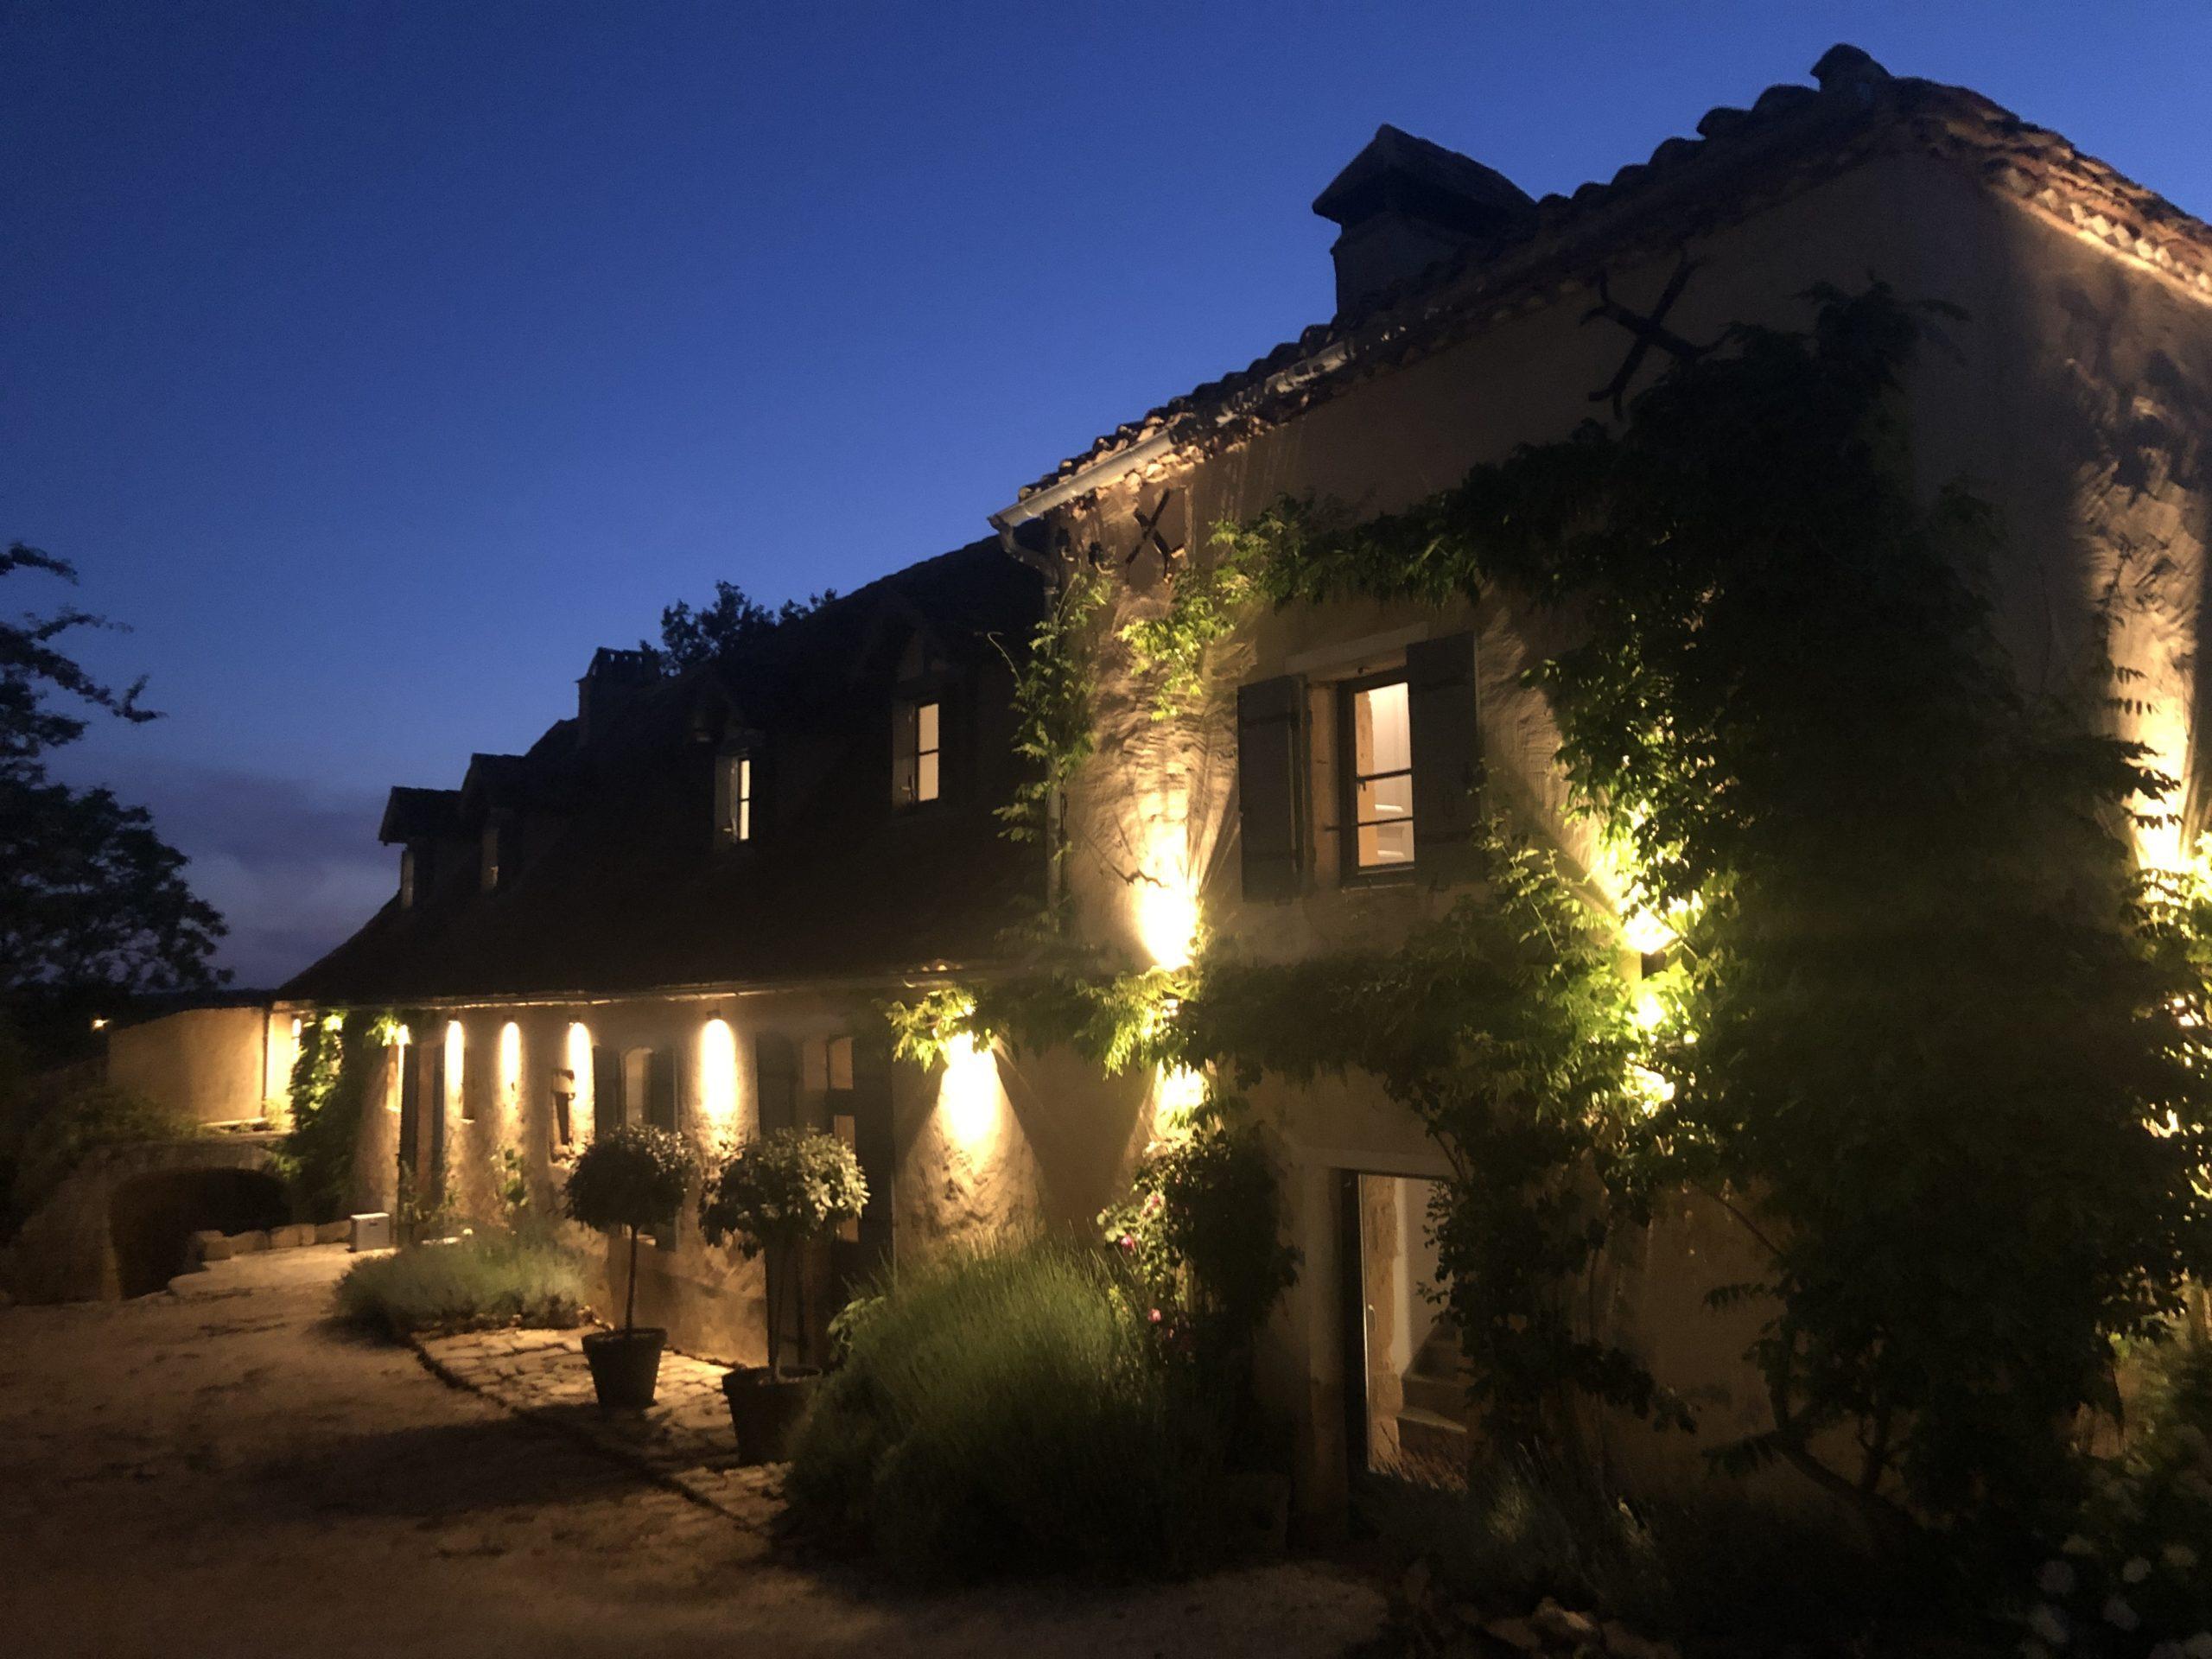 Le Mas, a Dordogne farmhouse lit at night